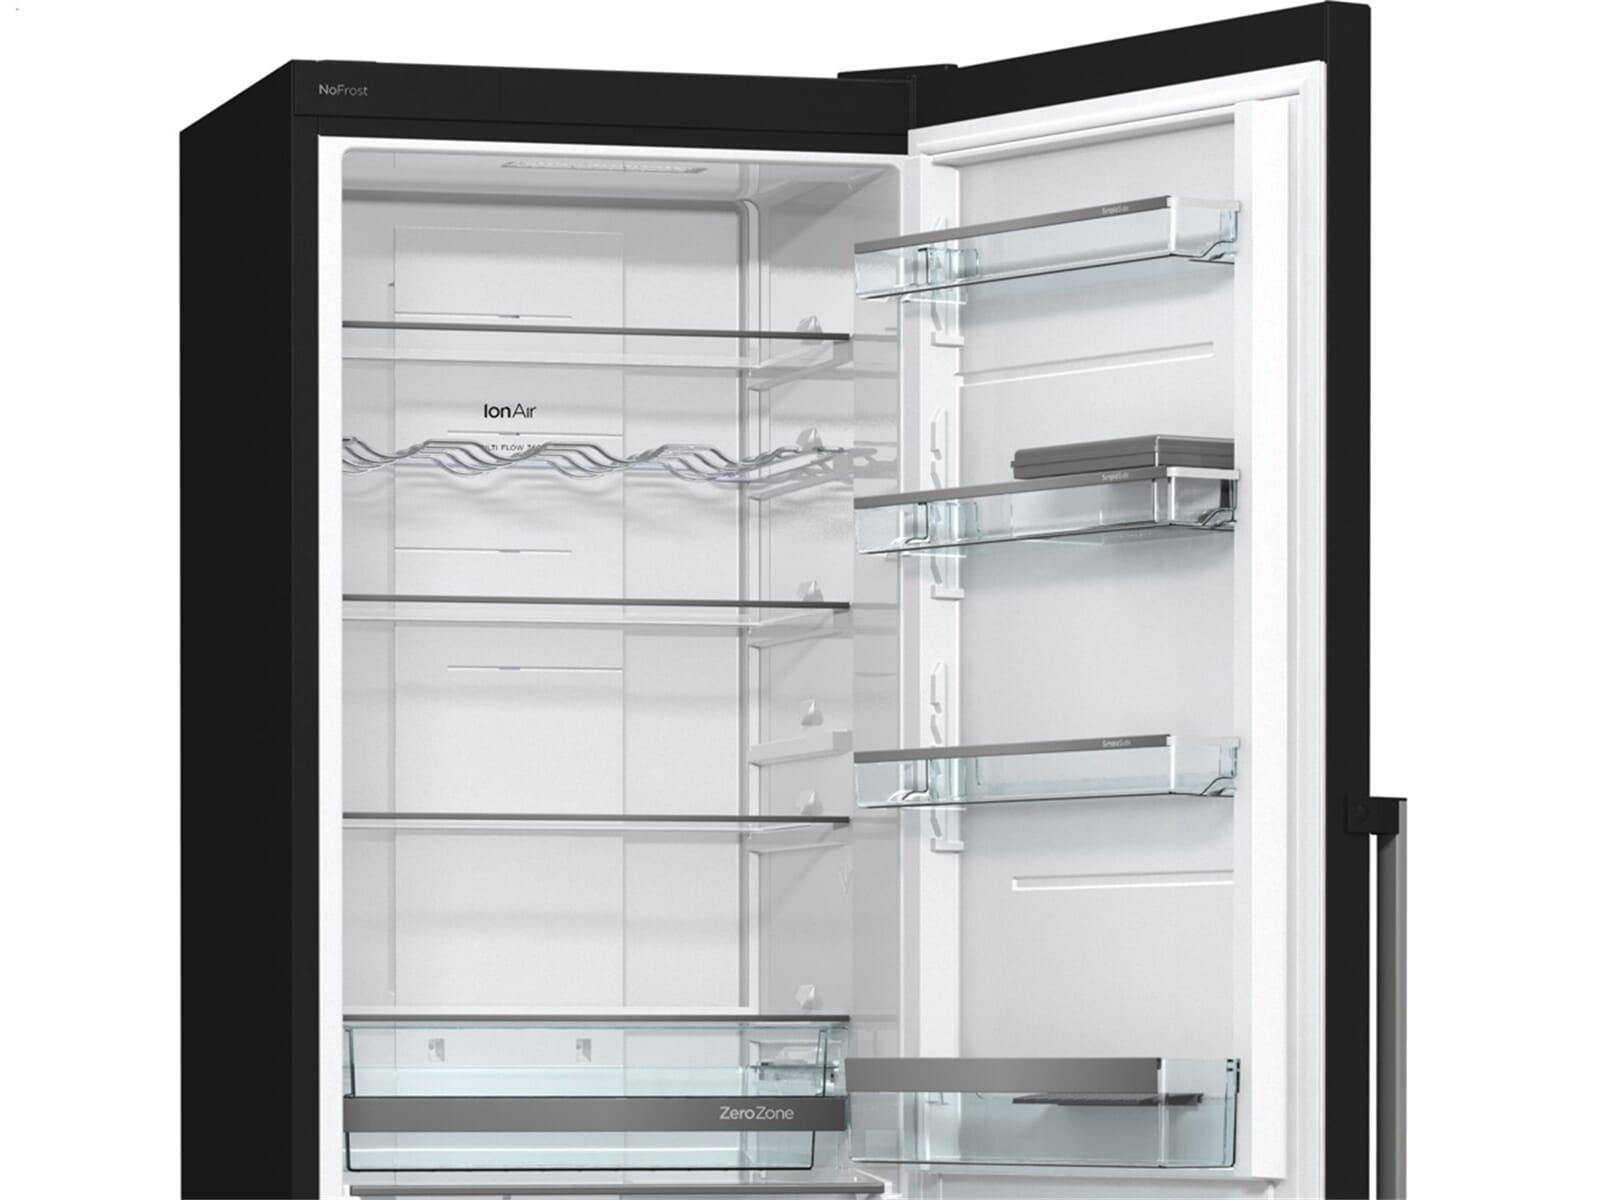 Gorenje Kühlschrank Verliert Wasser : Gorenje kühlschrank verliert wasser kühlschrank wasser unter dem